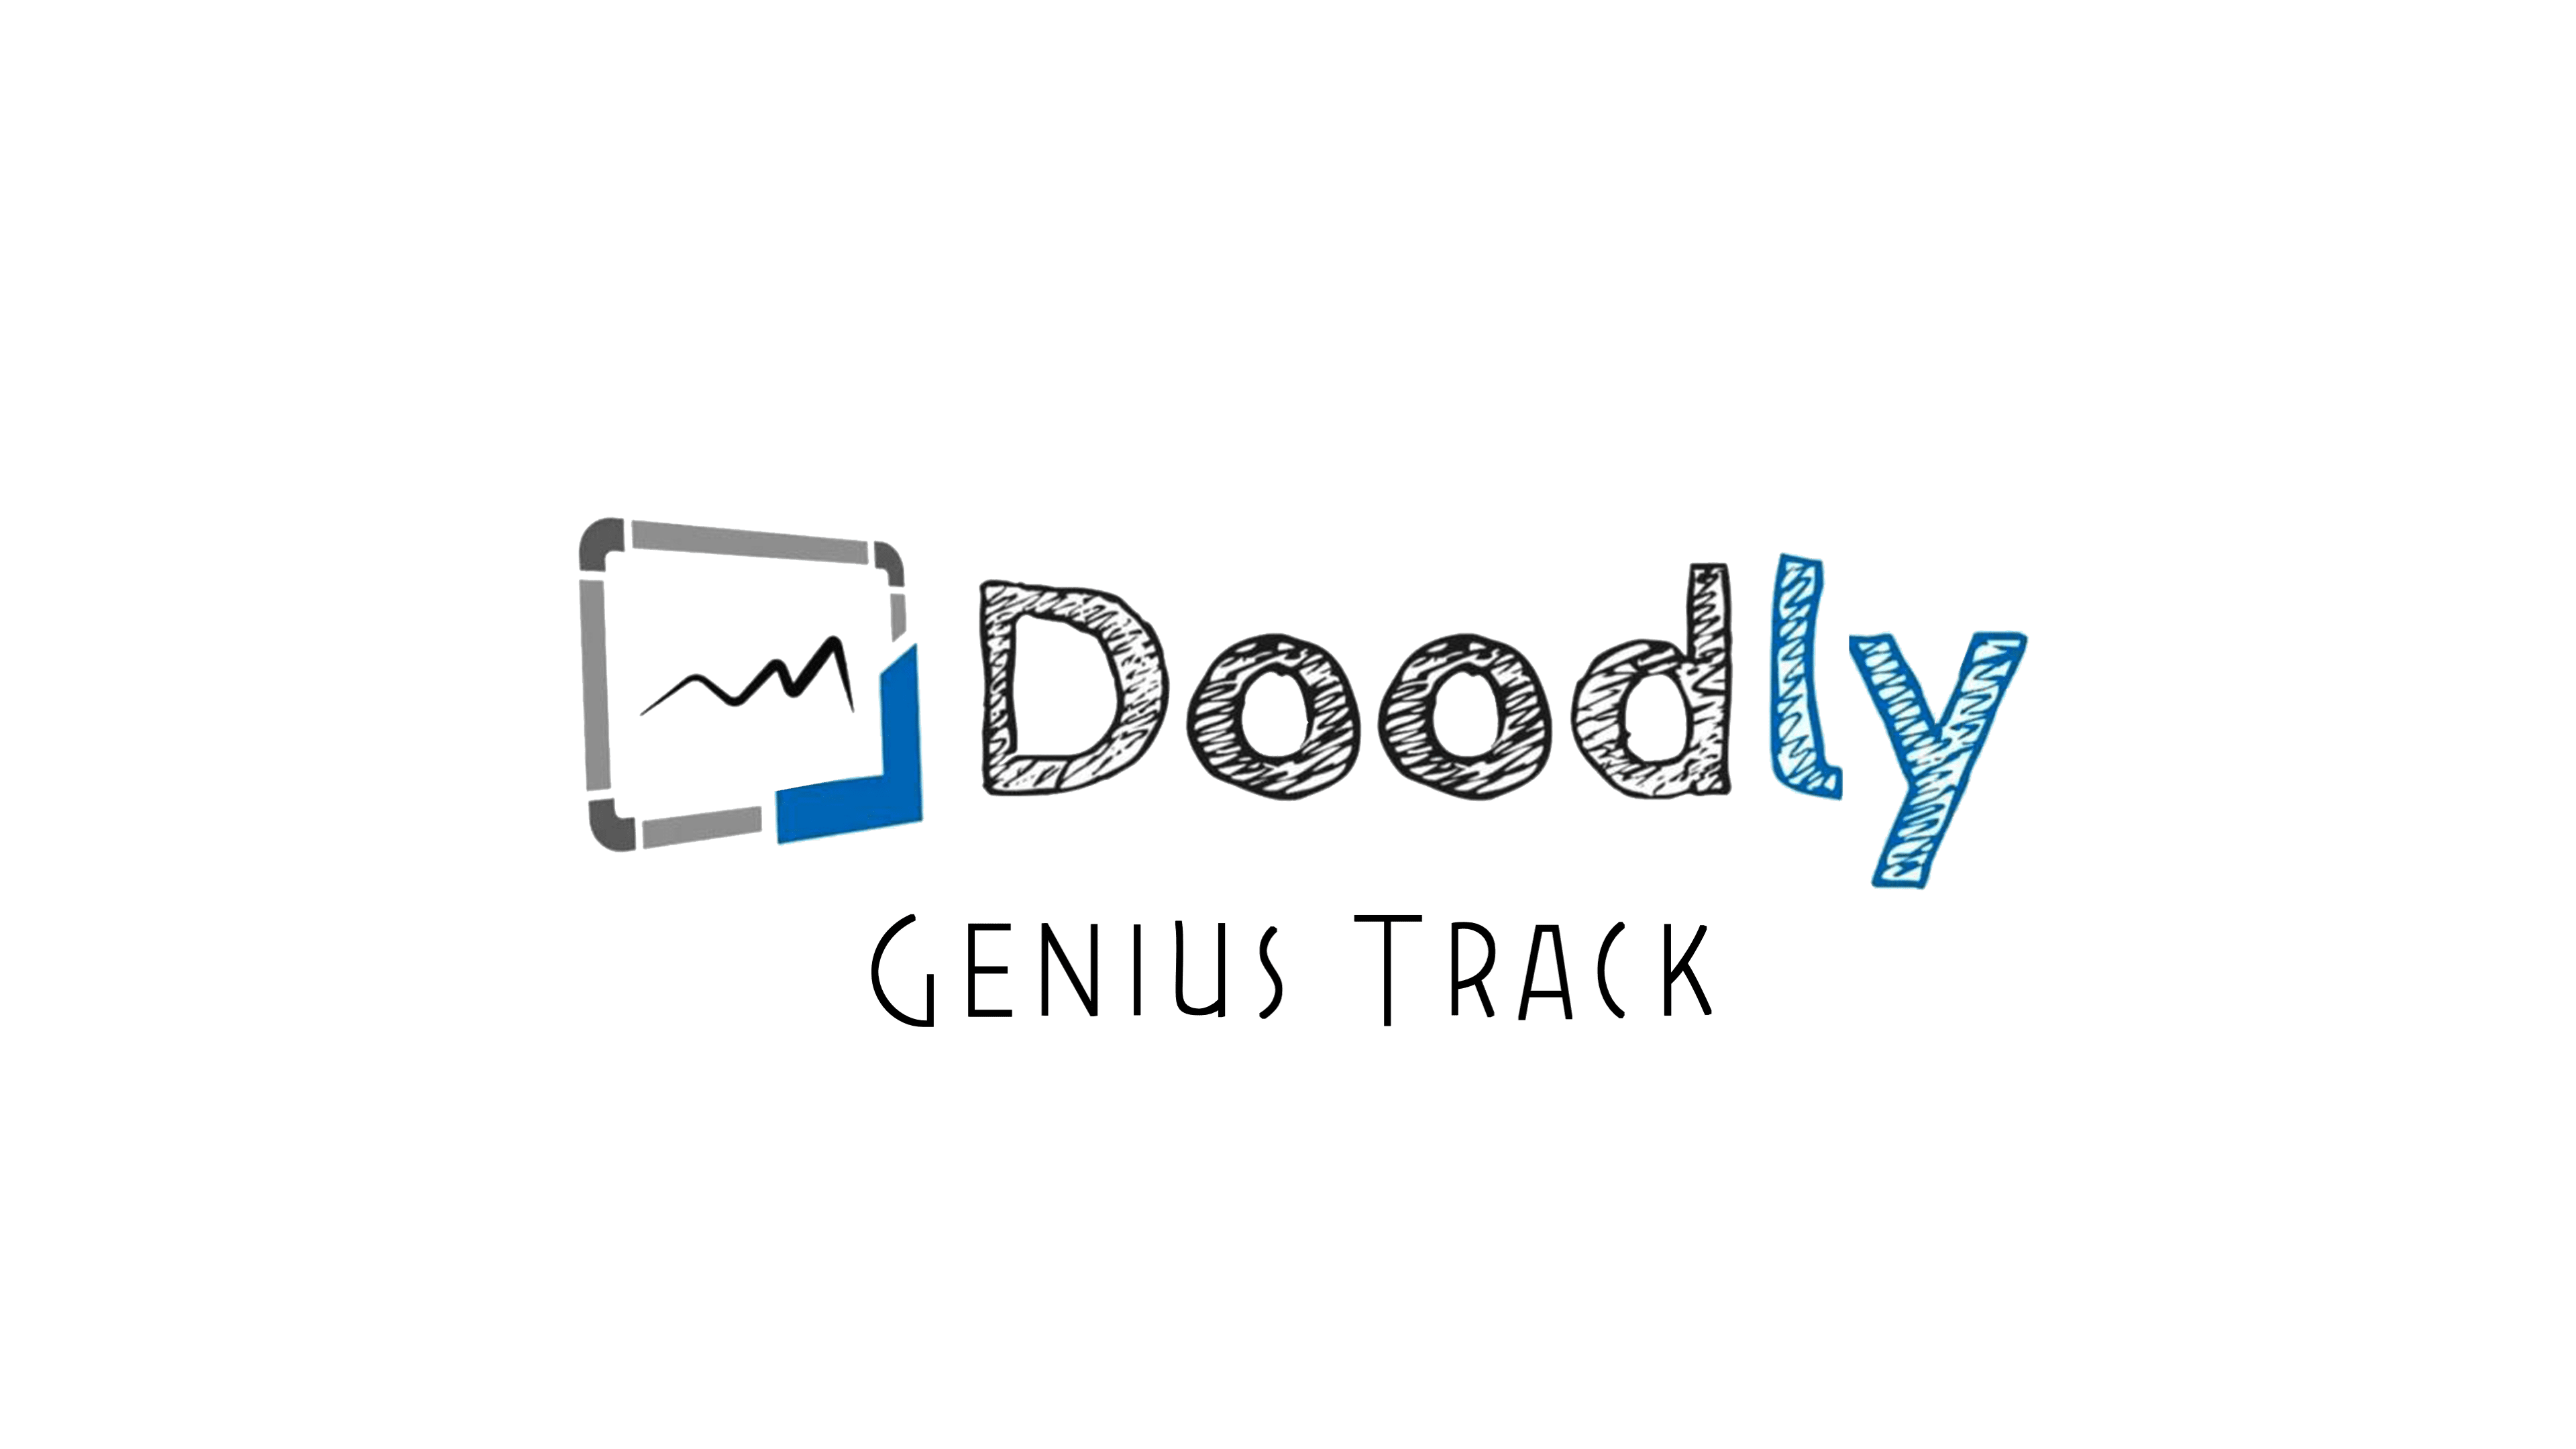 Doodly Genius Track Logo